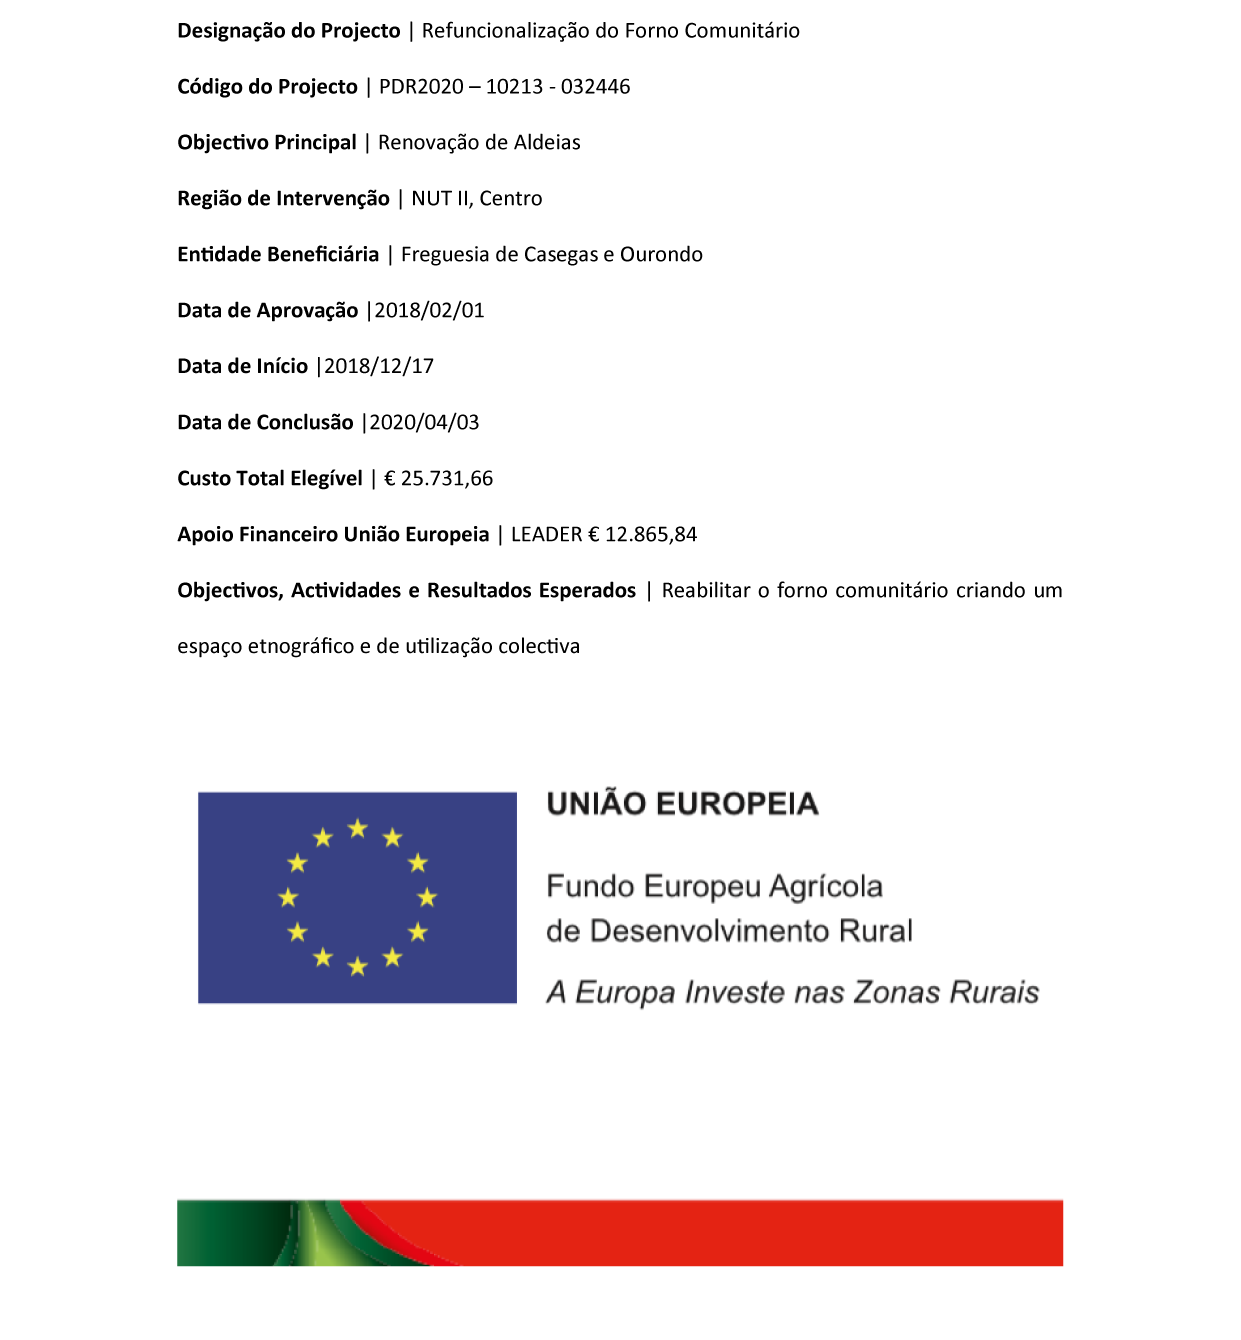 Ficha-do-Projecto-Ficha-Técnica-01